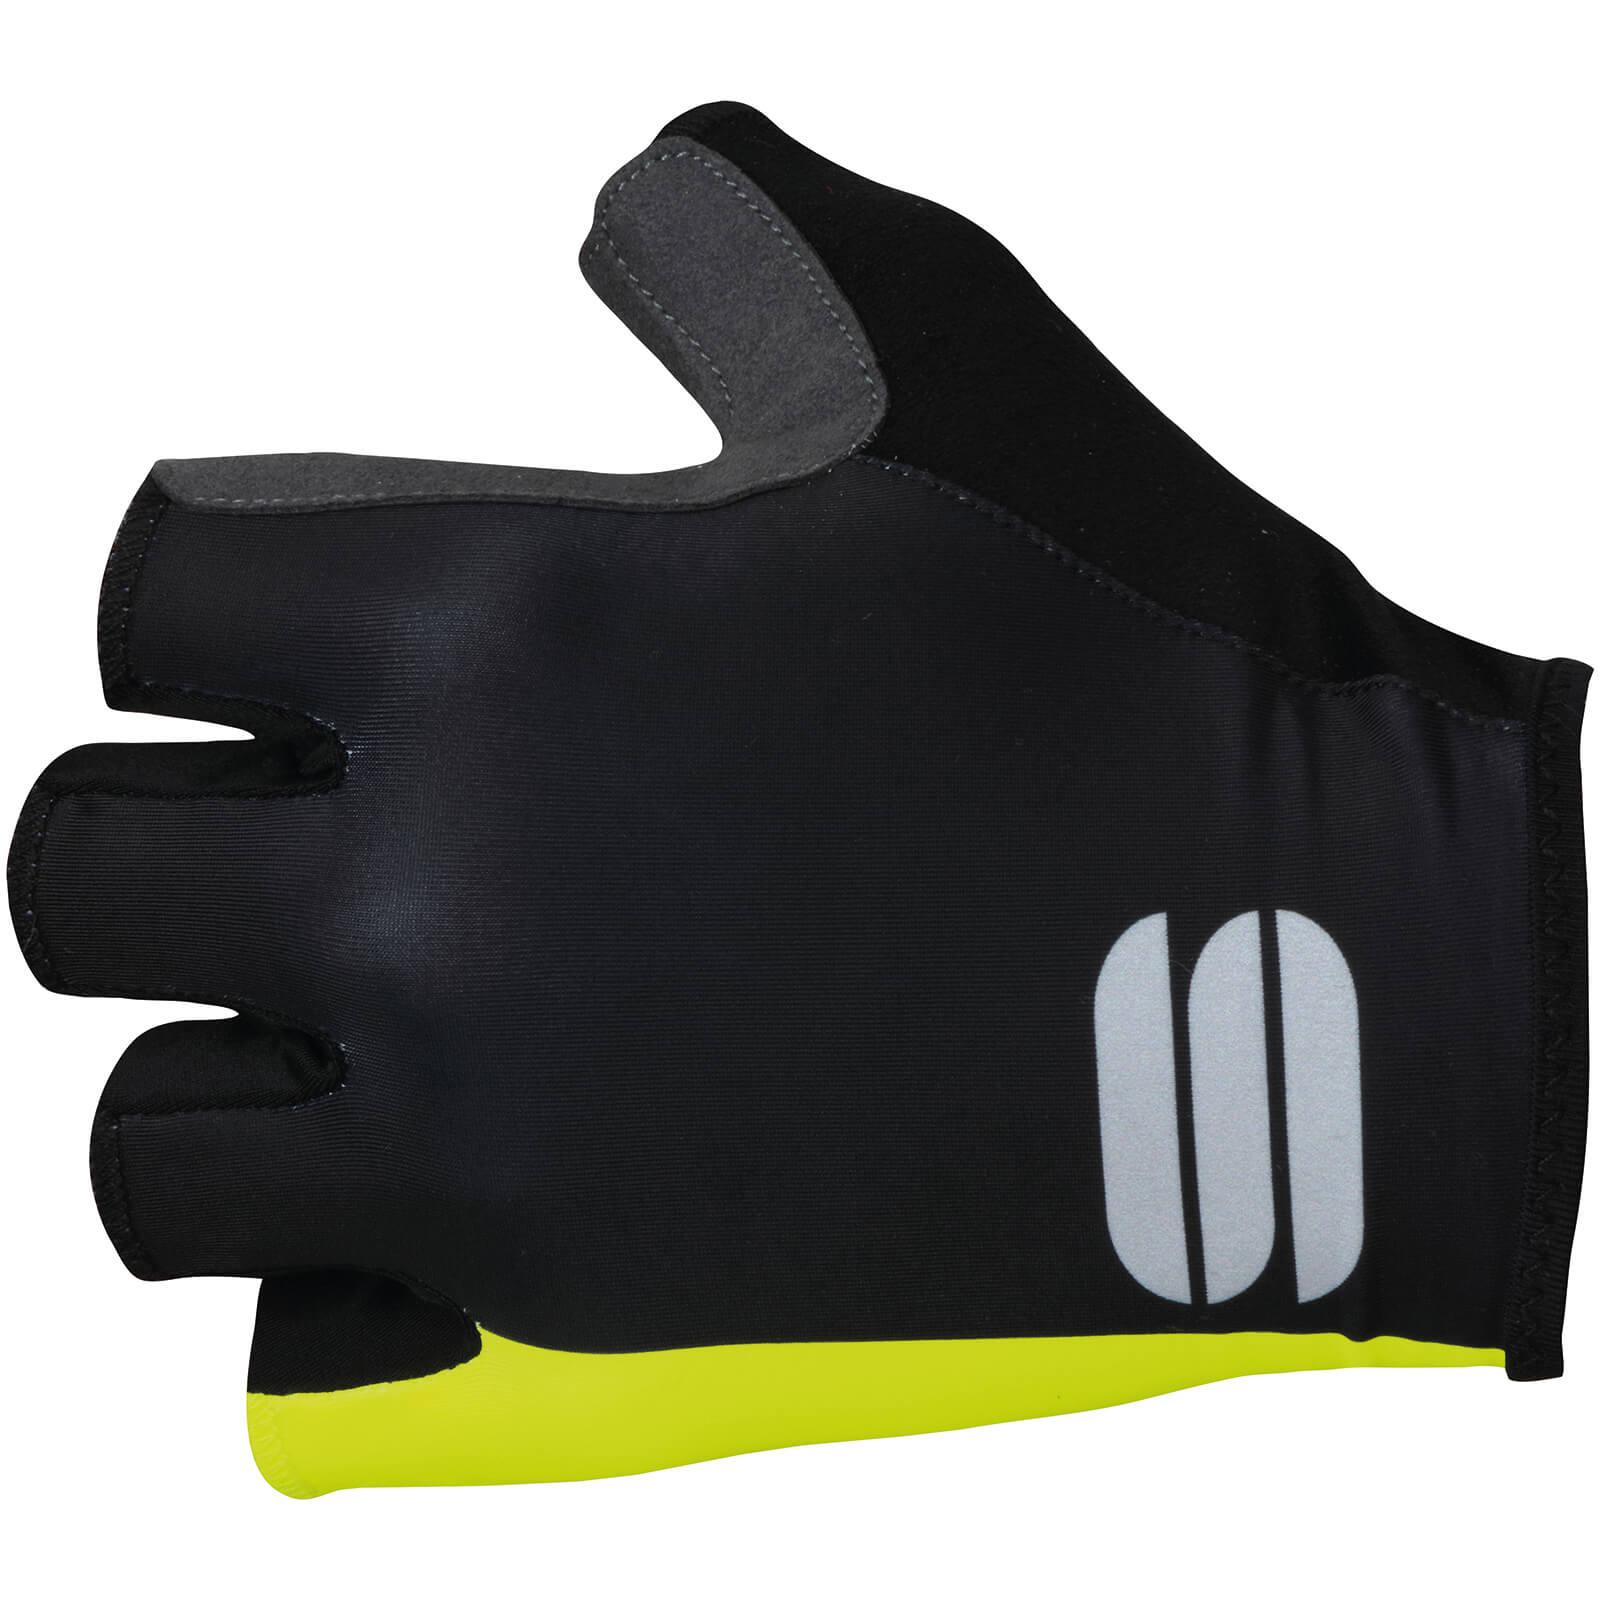 Sportful BodyFit Pro Gloves - S - Black/White